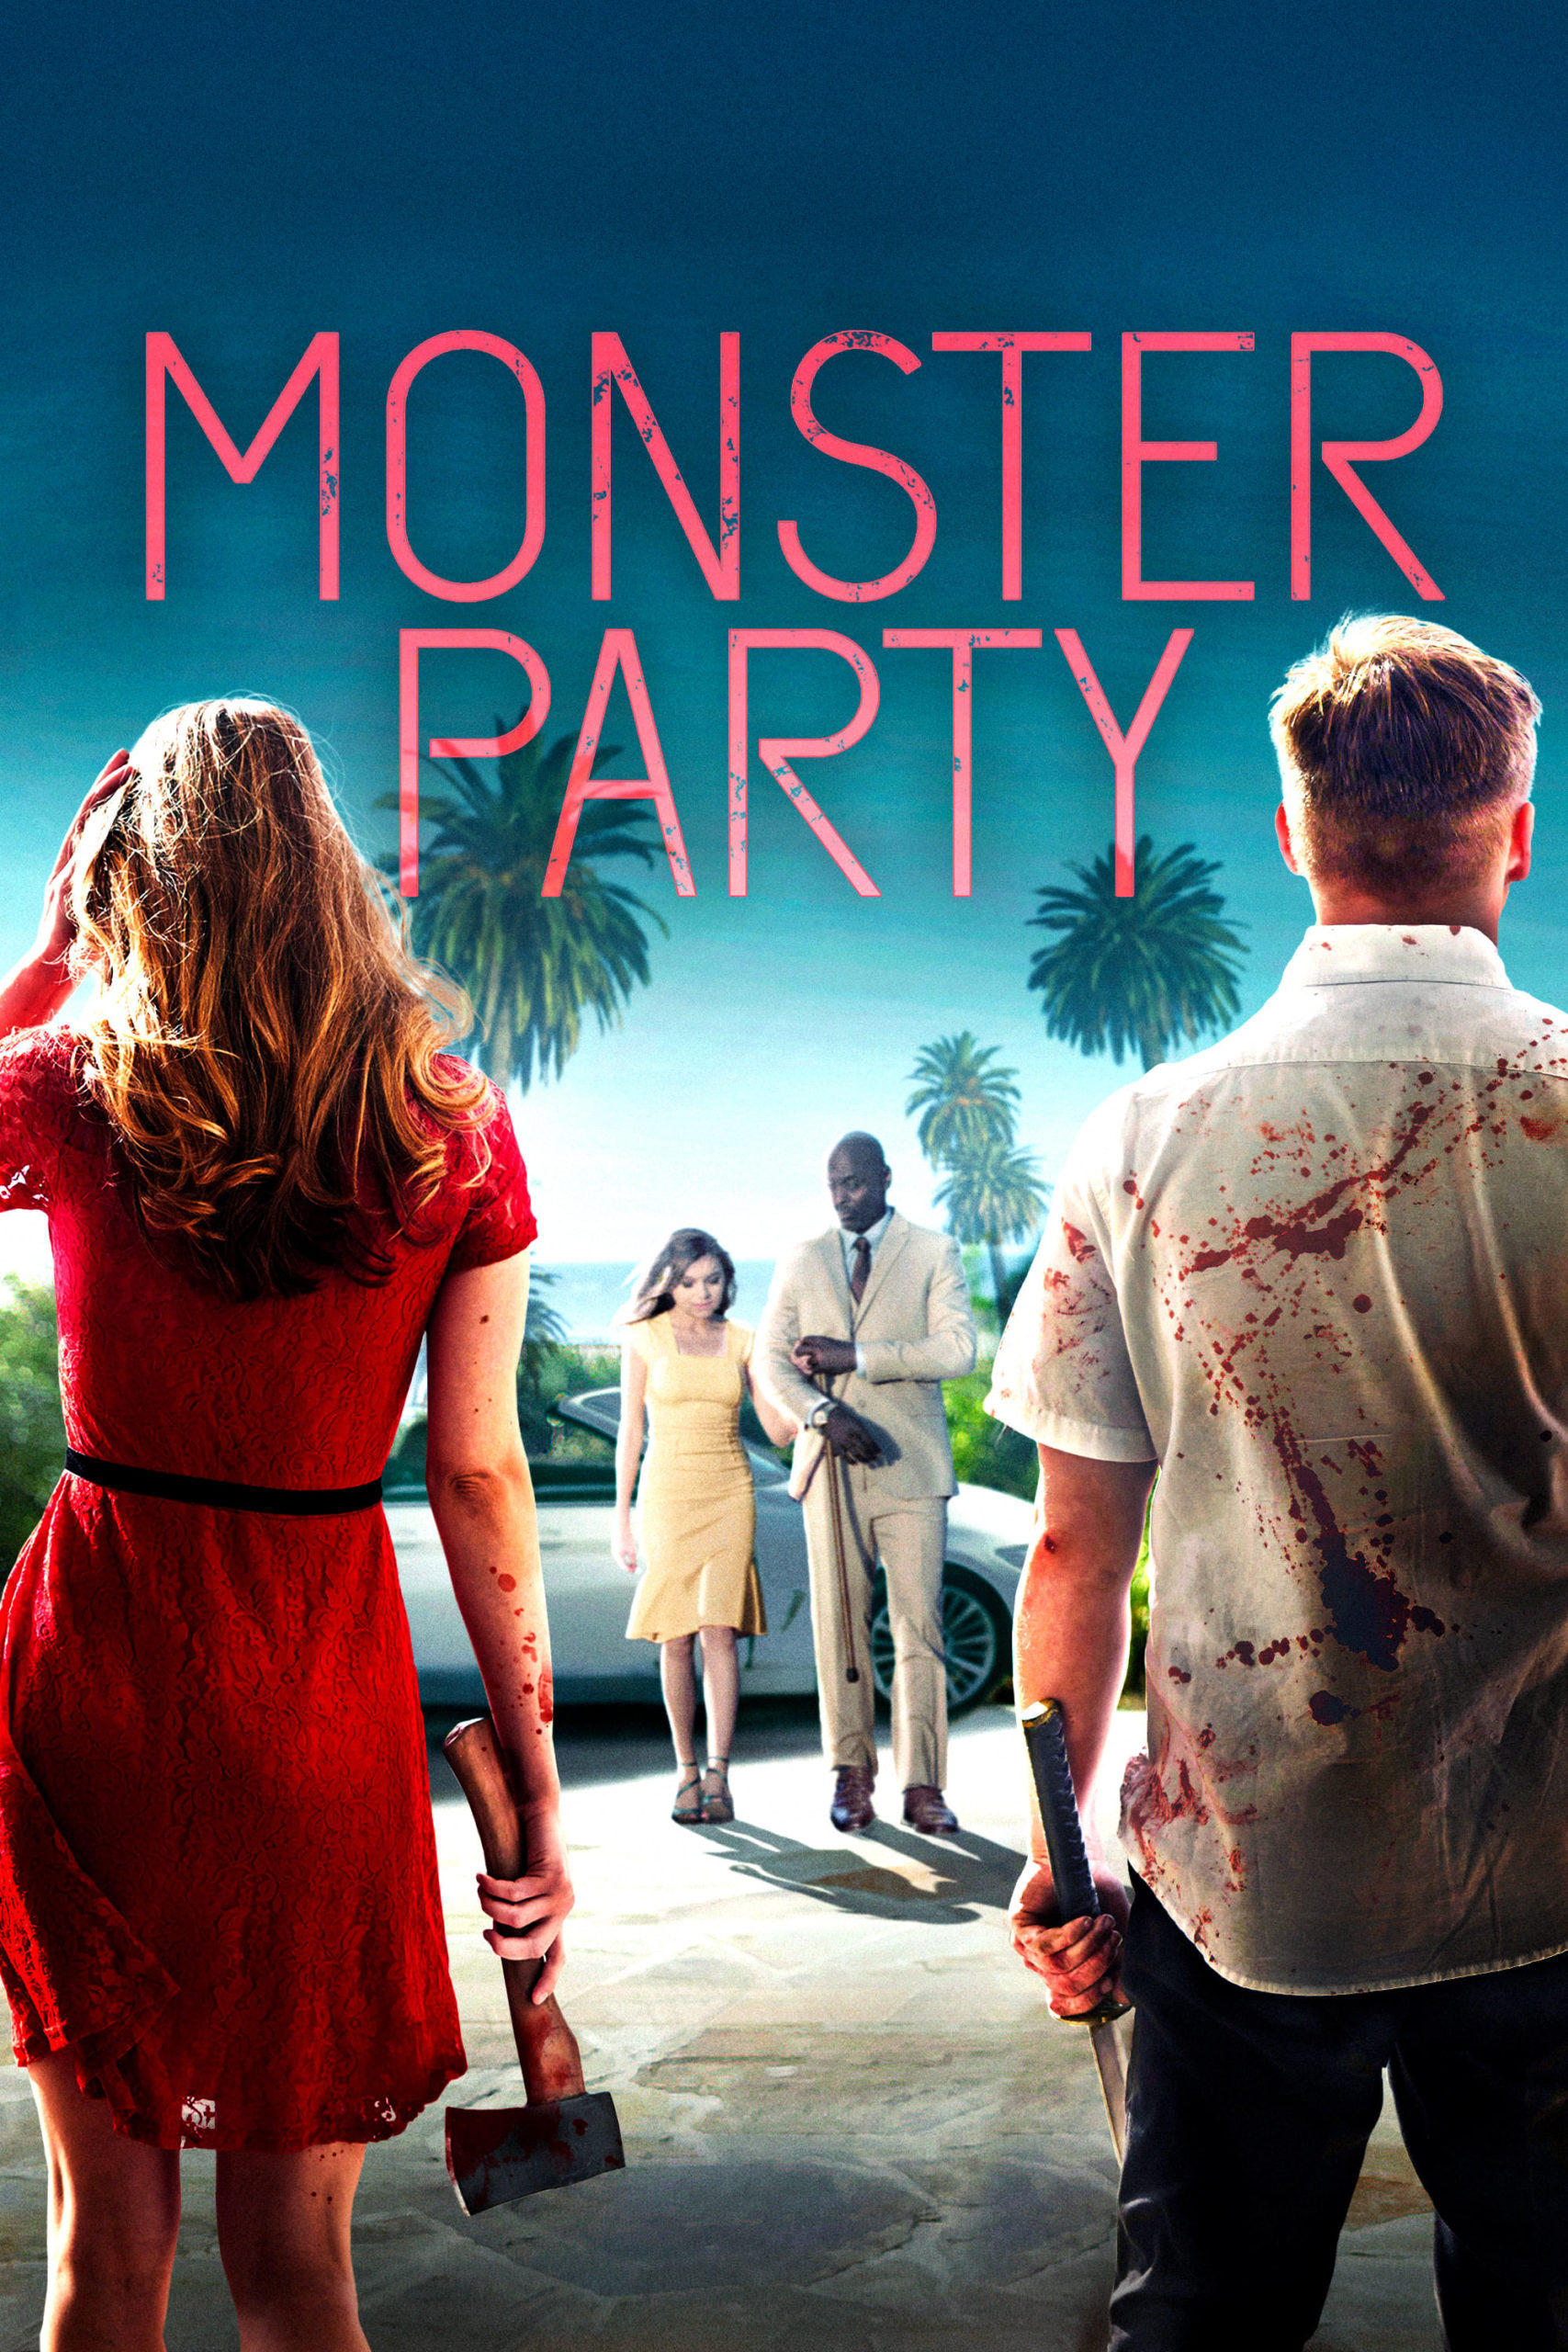 Regarder Monster Party en streaming gratuit